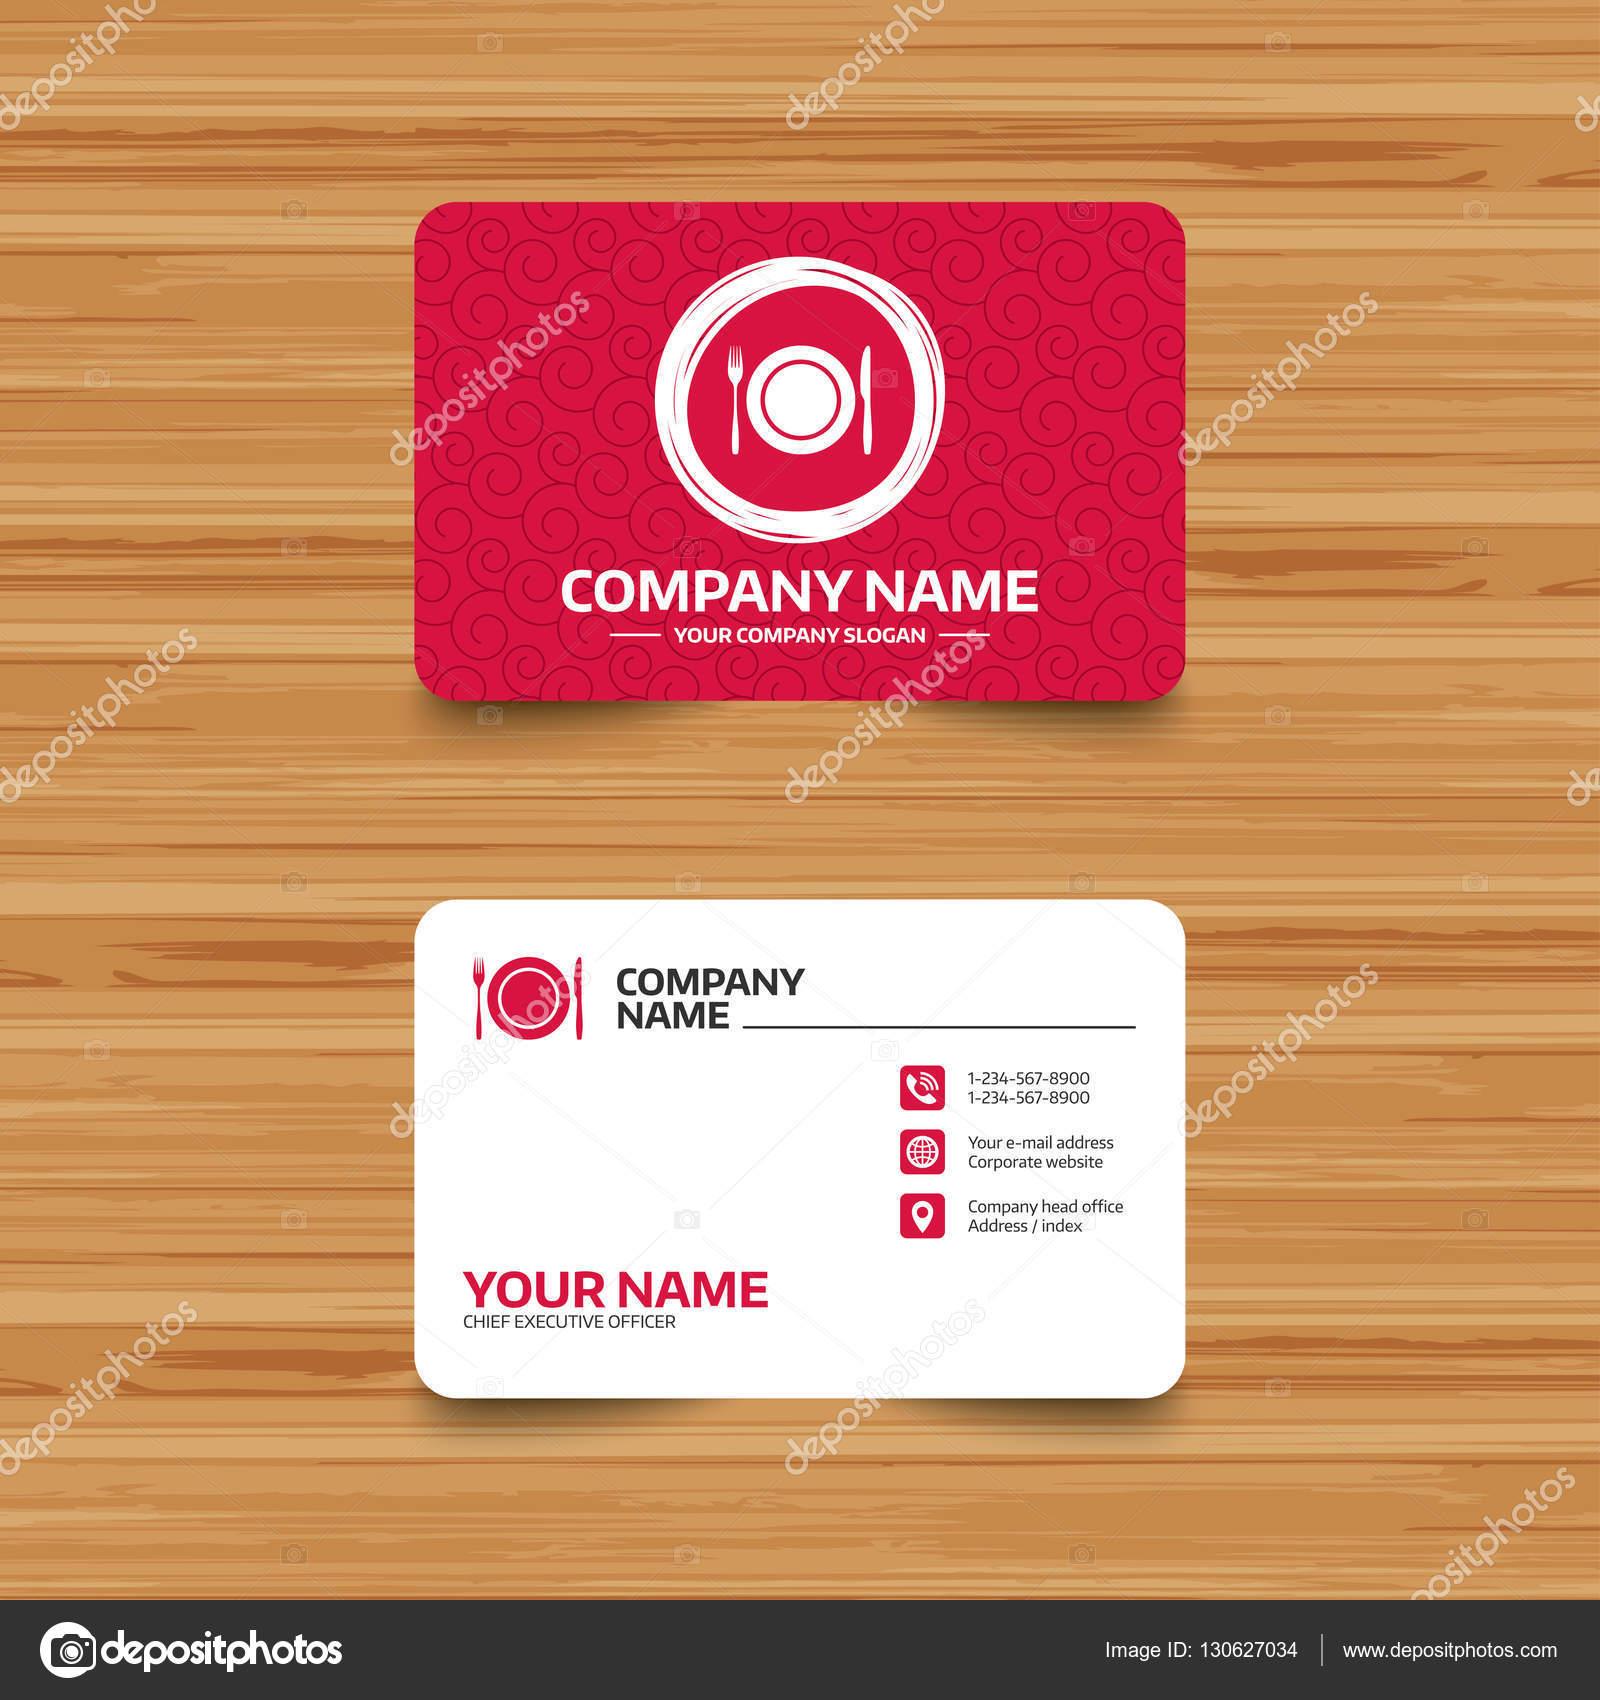 Visitenkarte Vorlage Mit Textur Stockvektor Blankstock